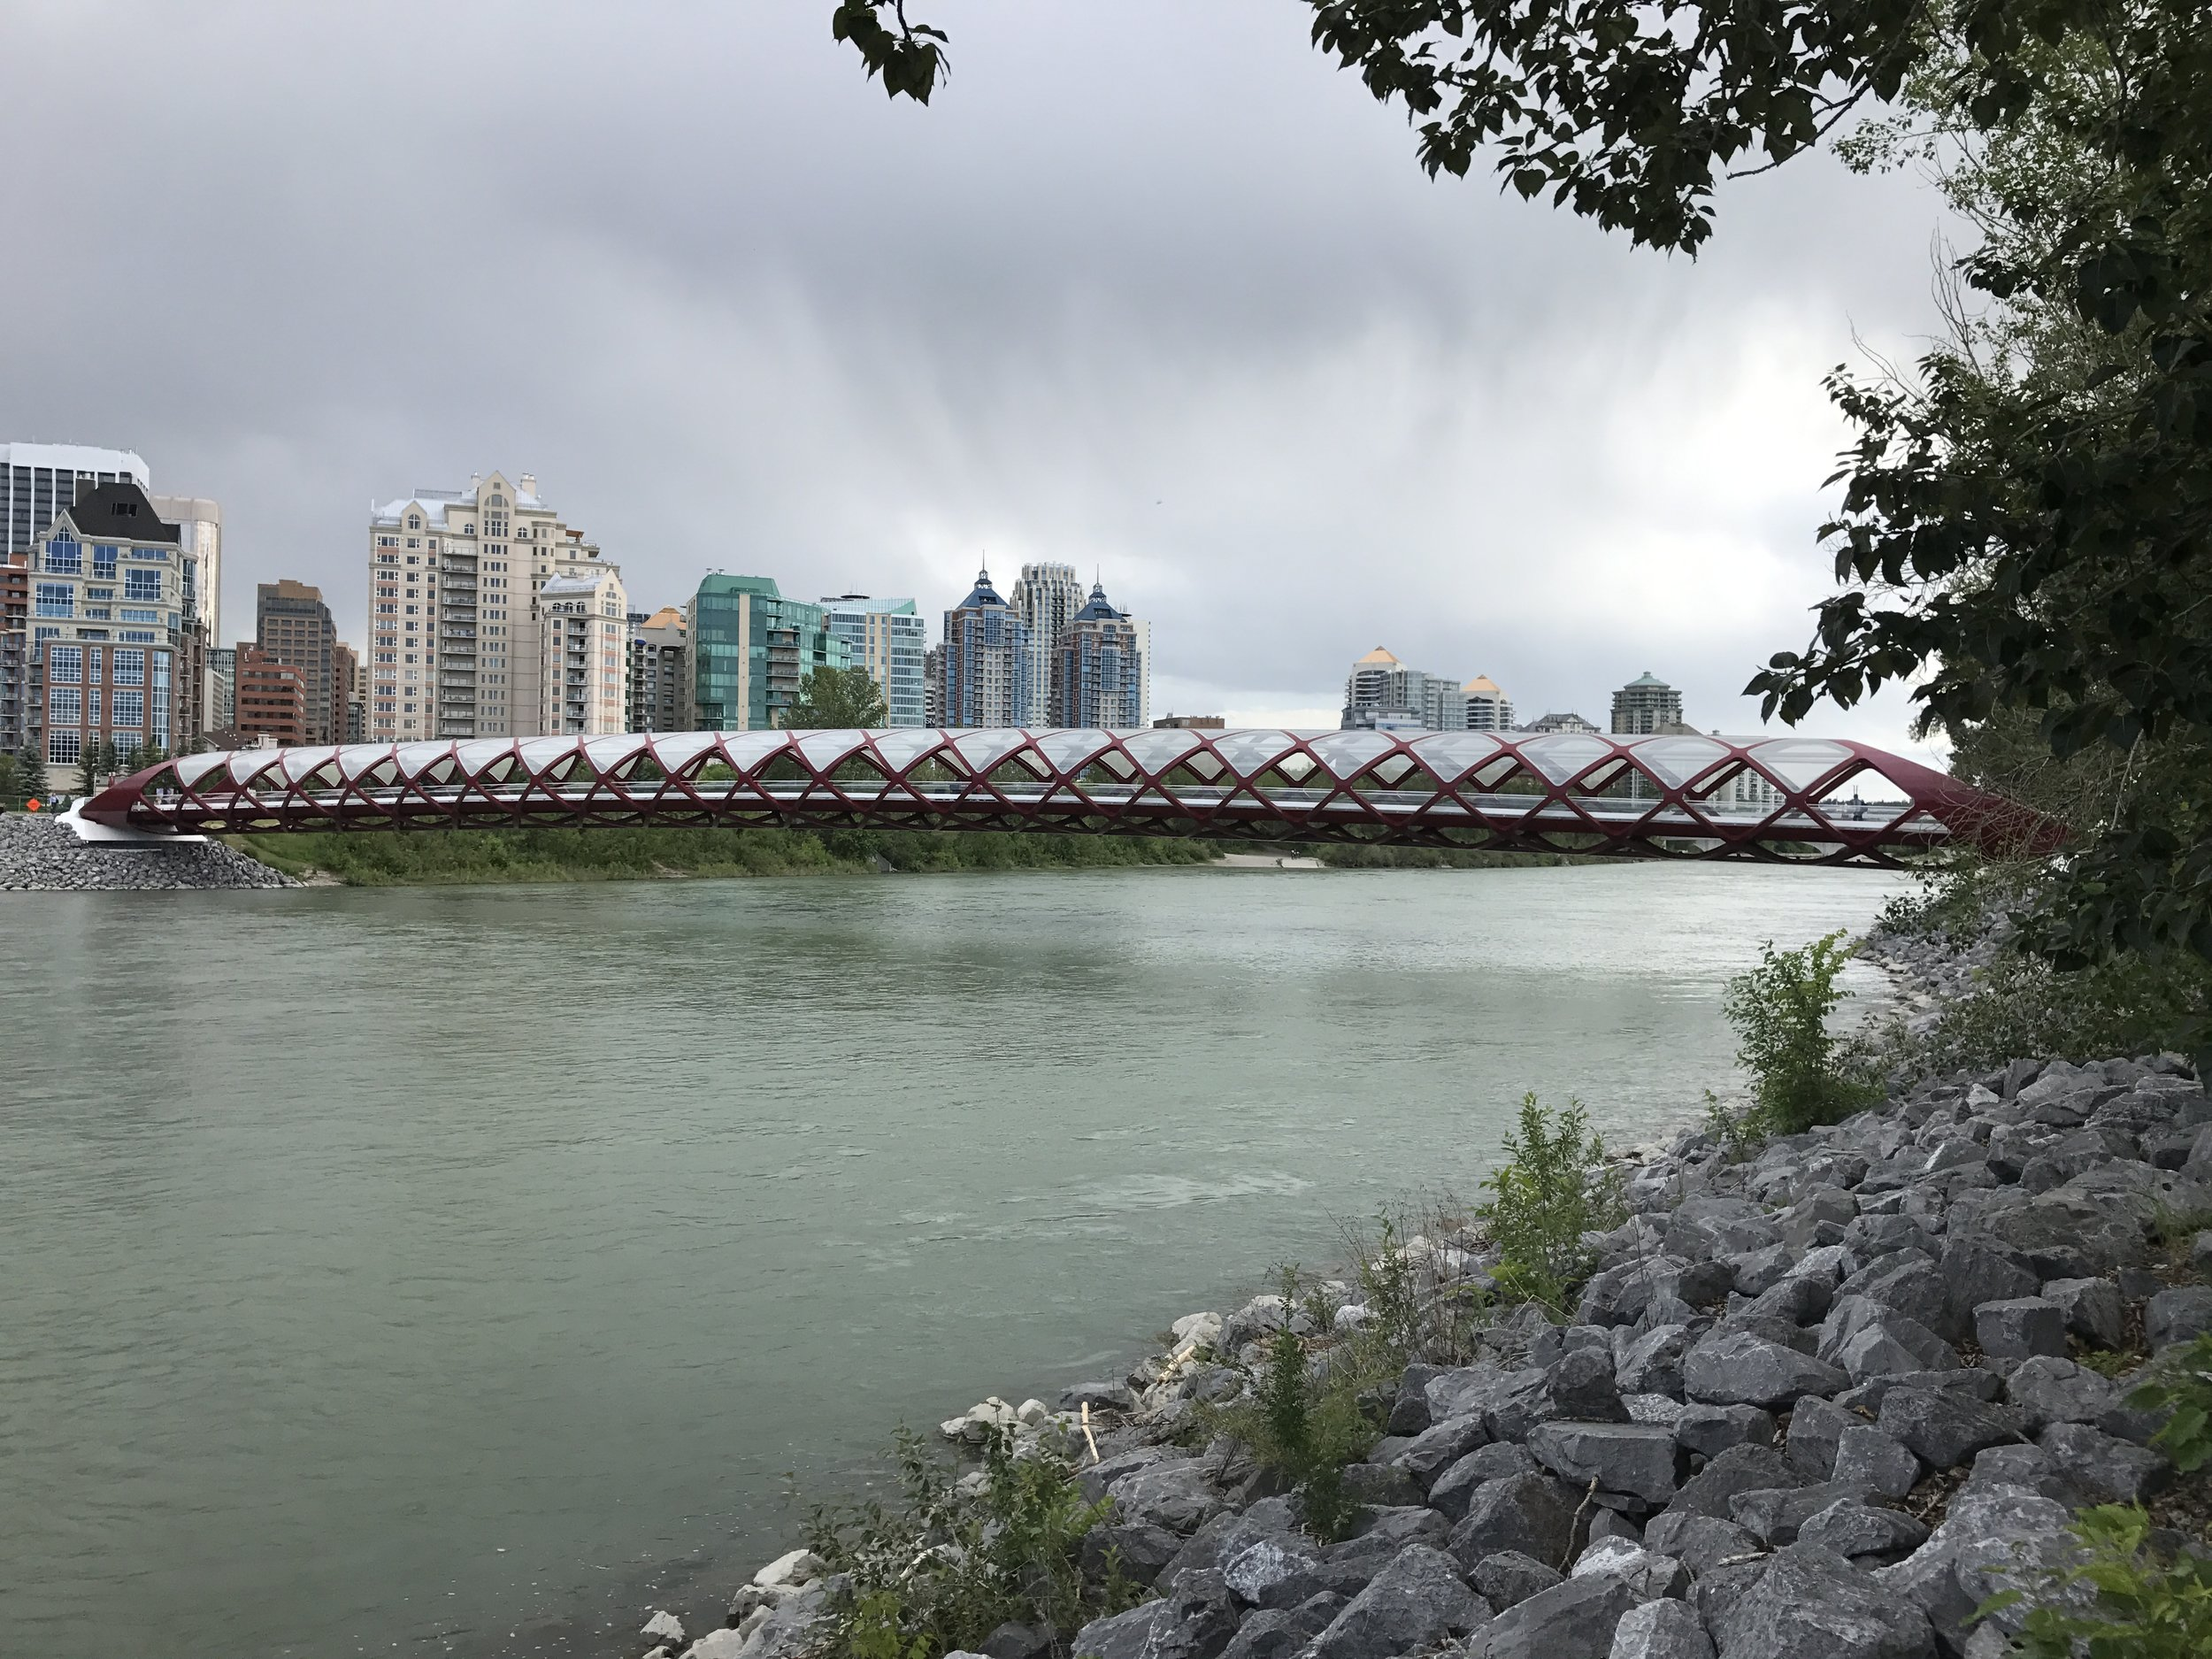 The Peace Bridge. Denise's son helped design and build it.